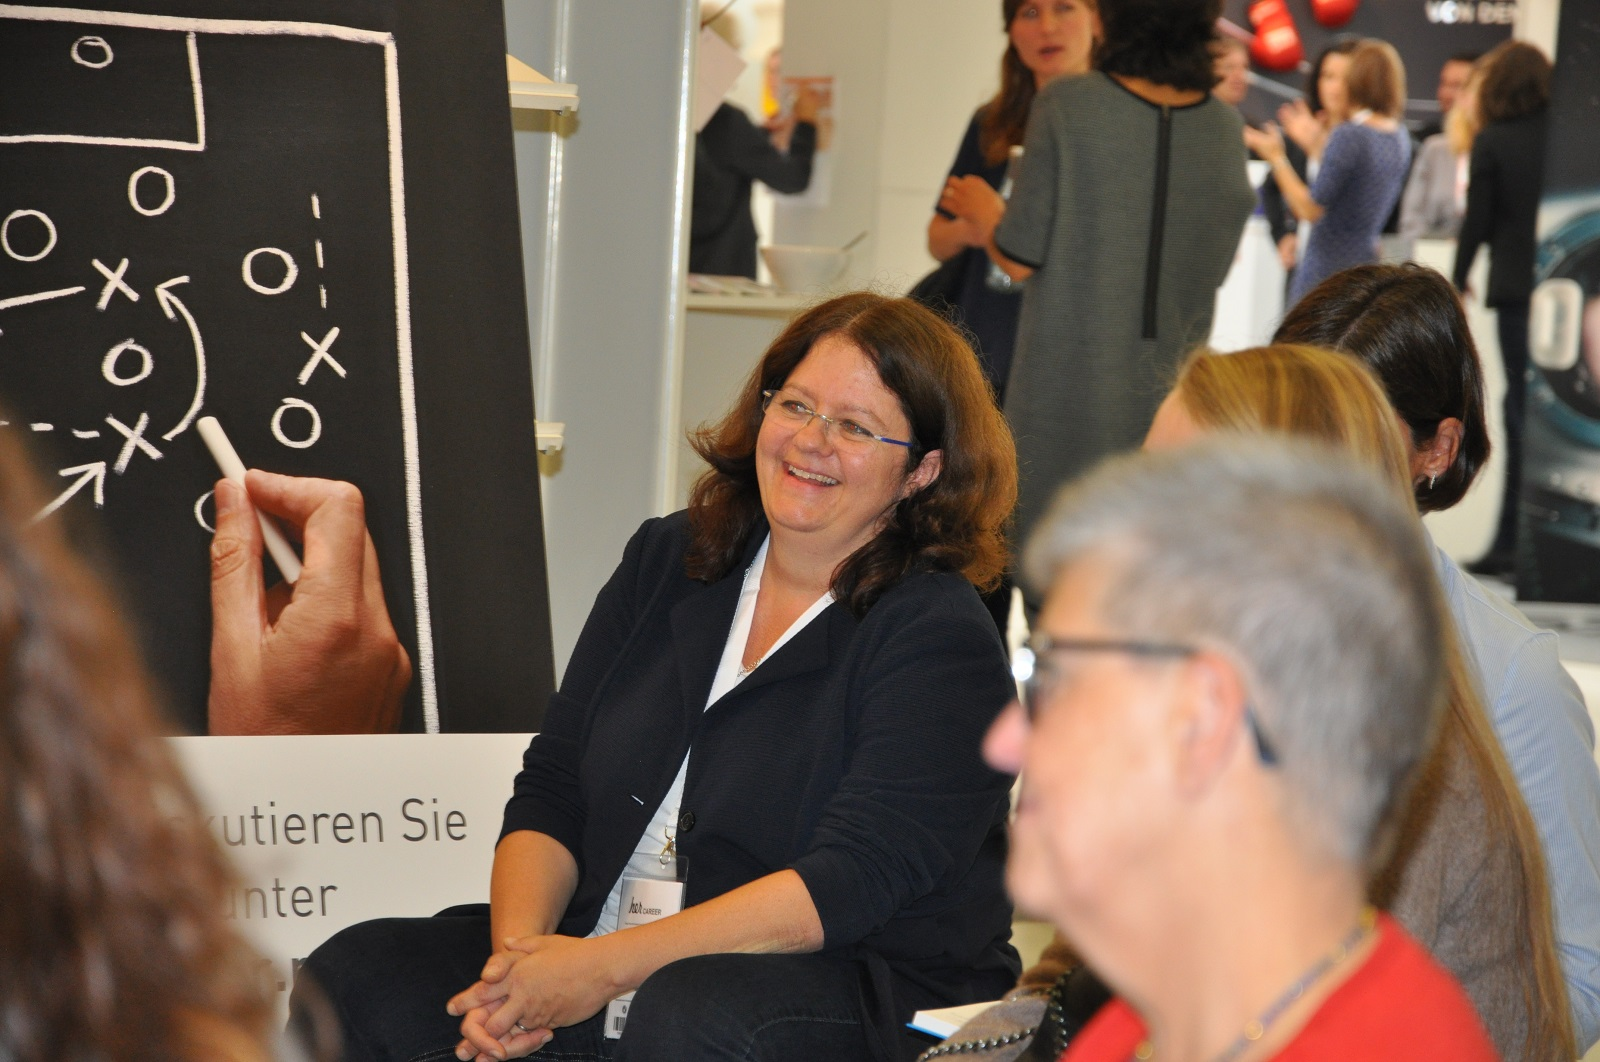 Birgit Königsheim, Nokia